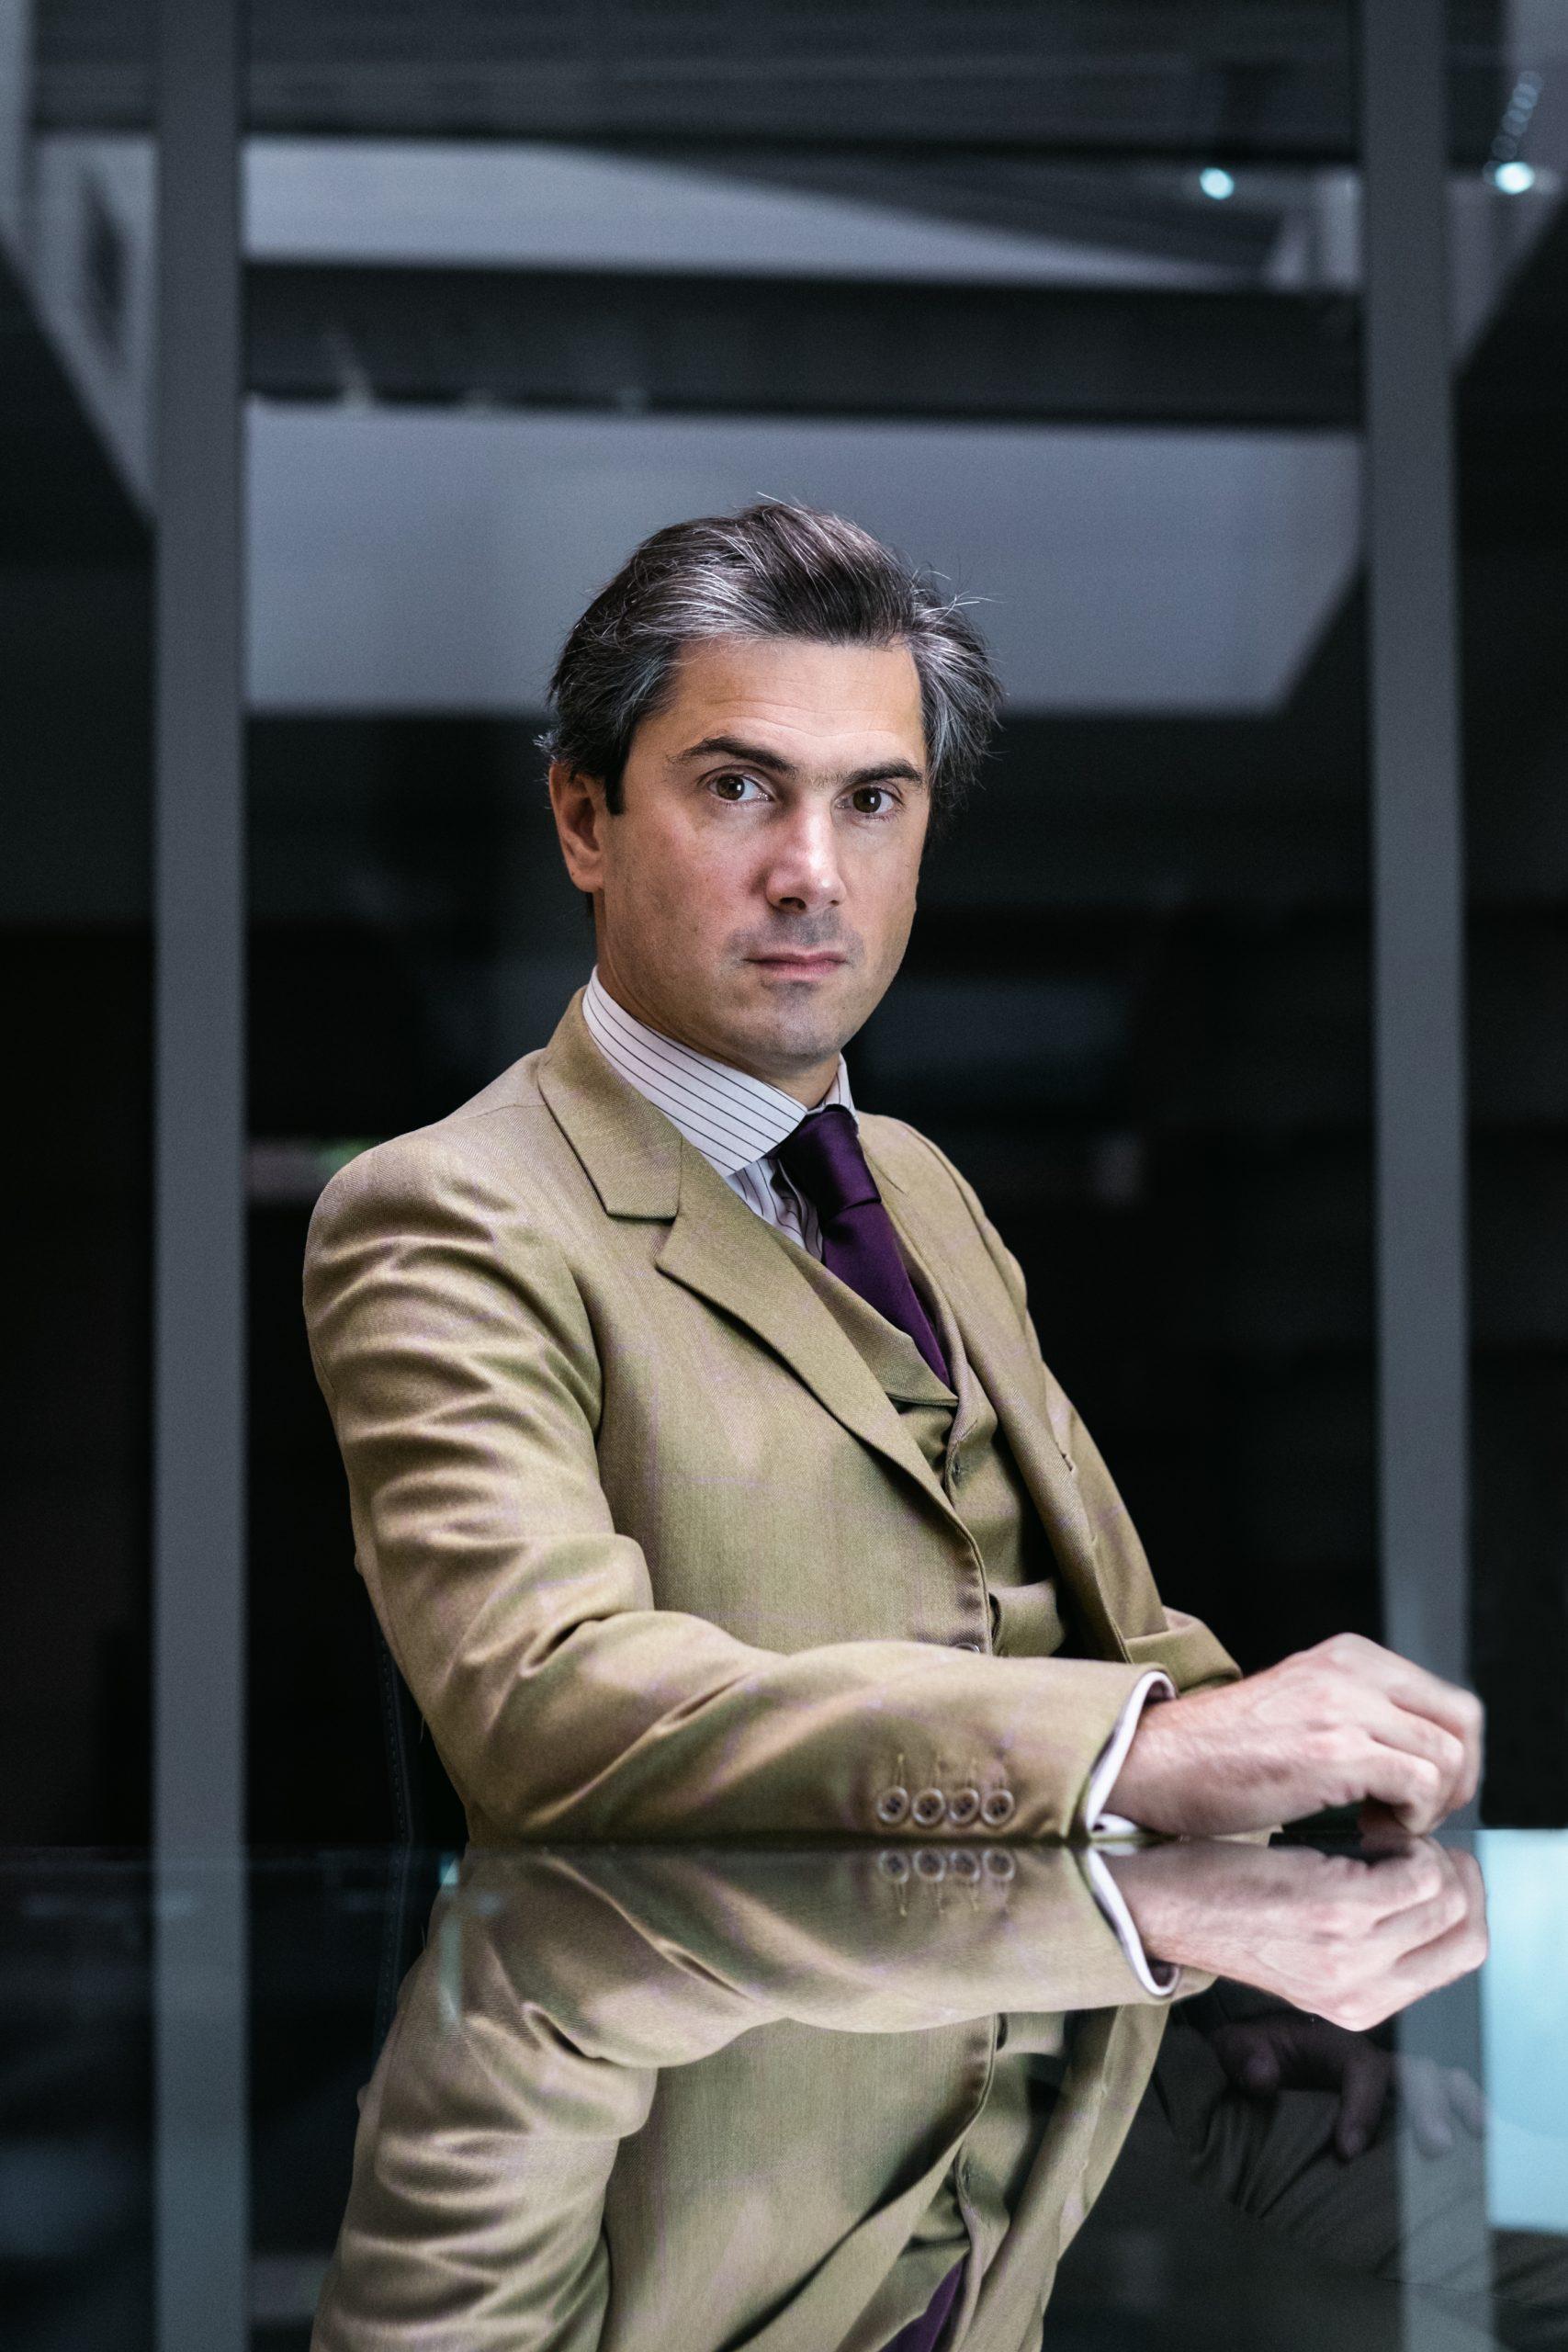 Sylvain Pelletreau